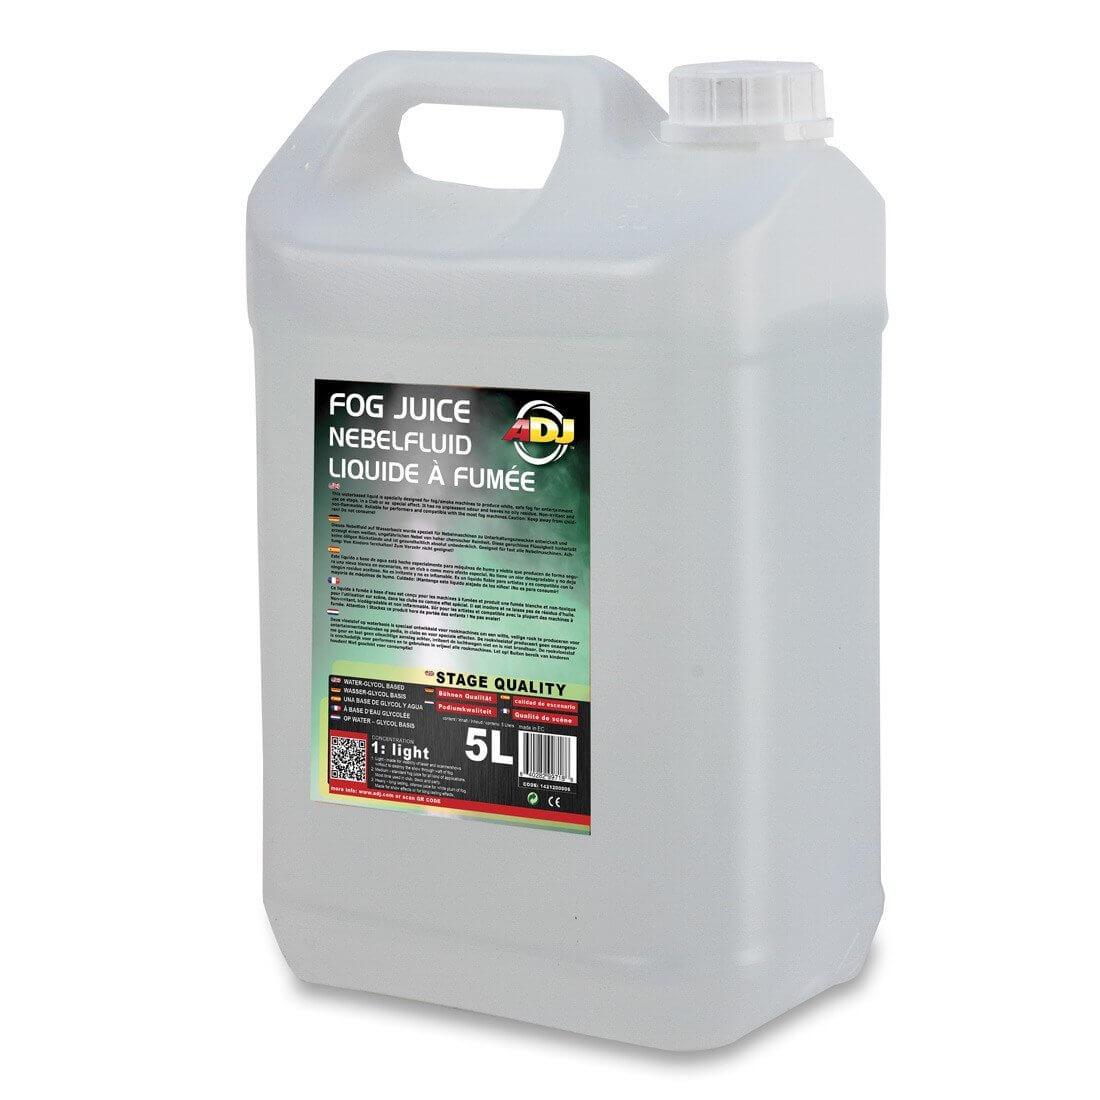 ADJ Fog Juice Light 5 Litres